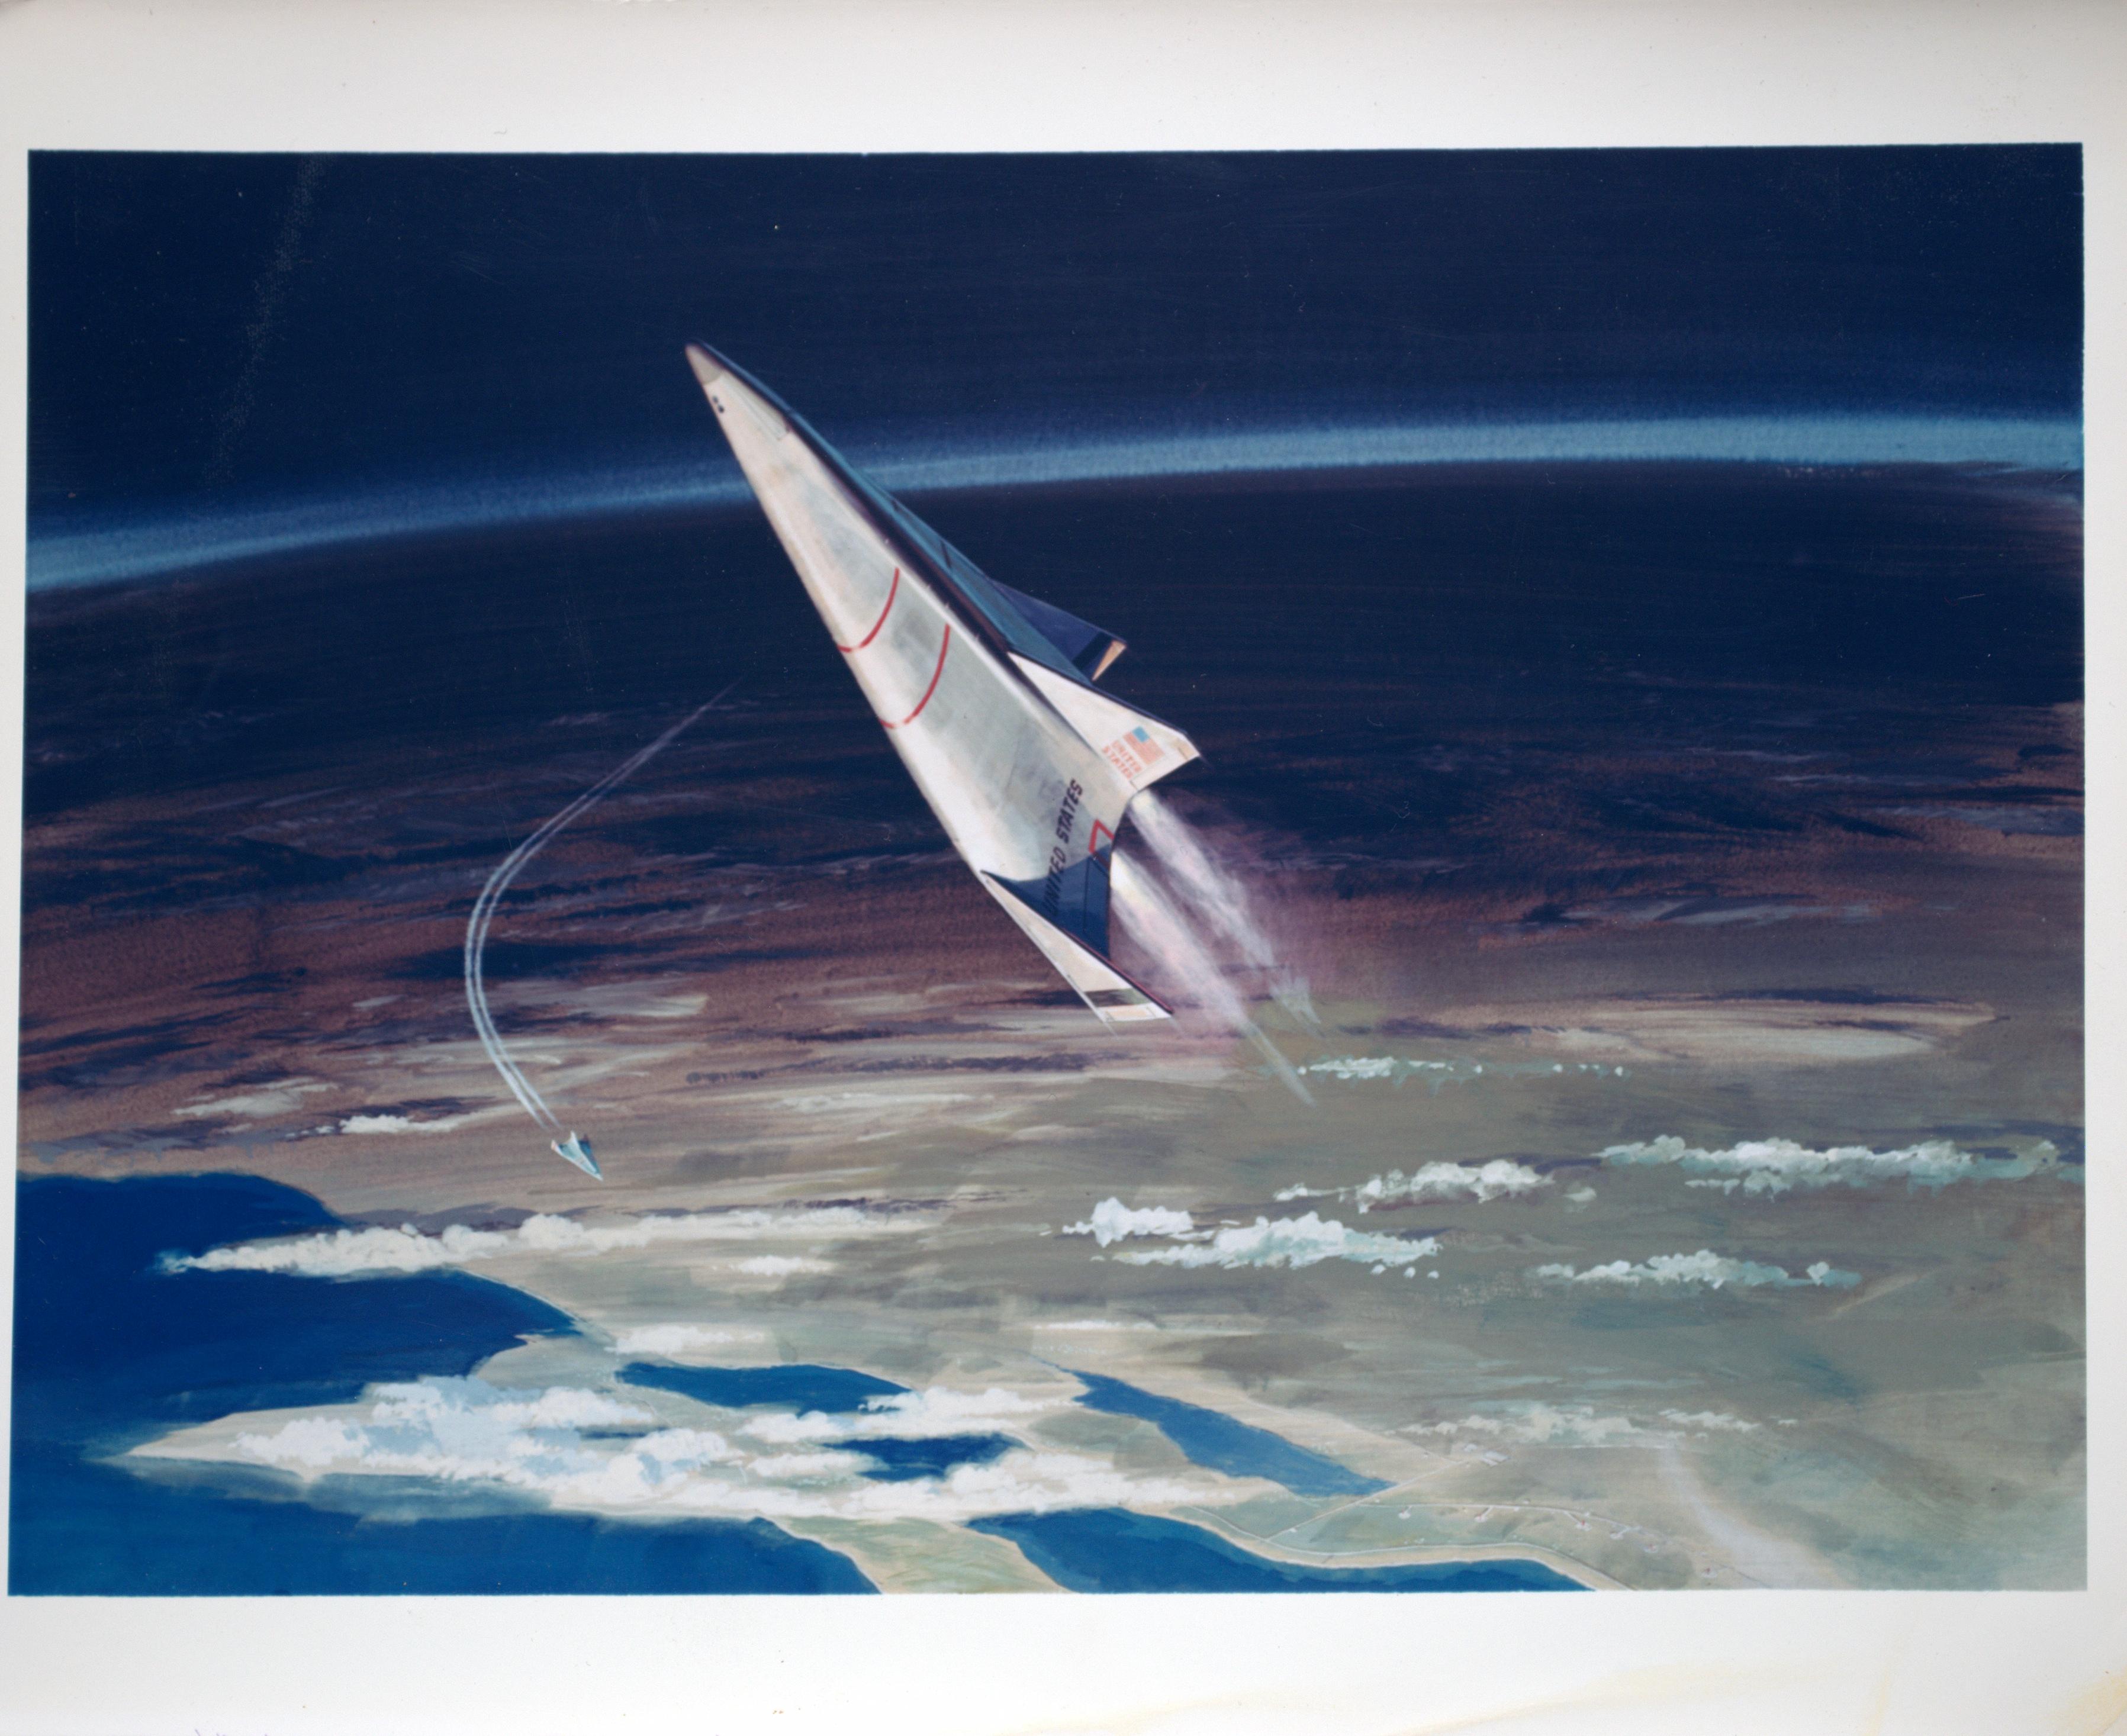 nasa space shuttle design - photo #19